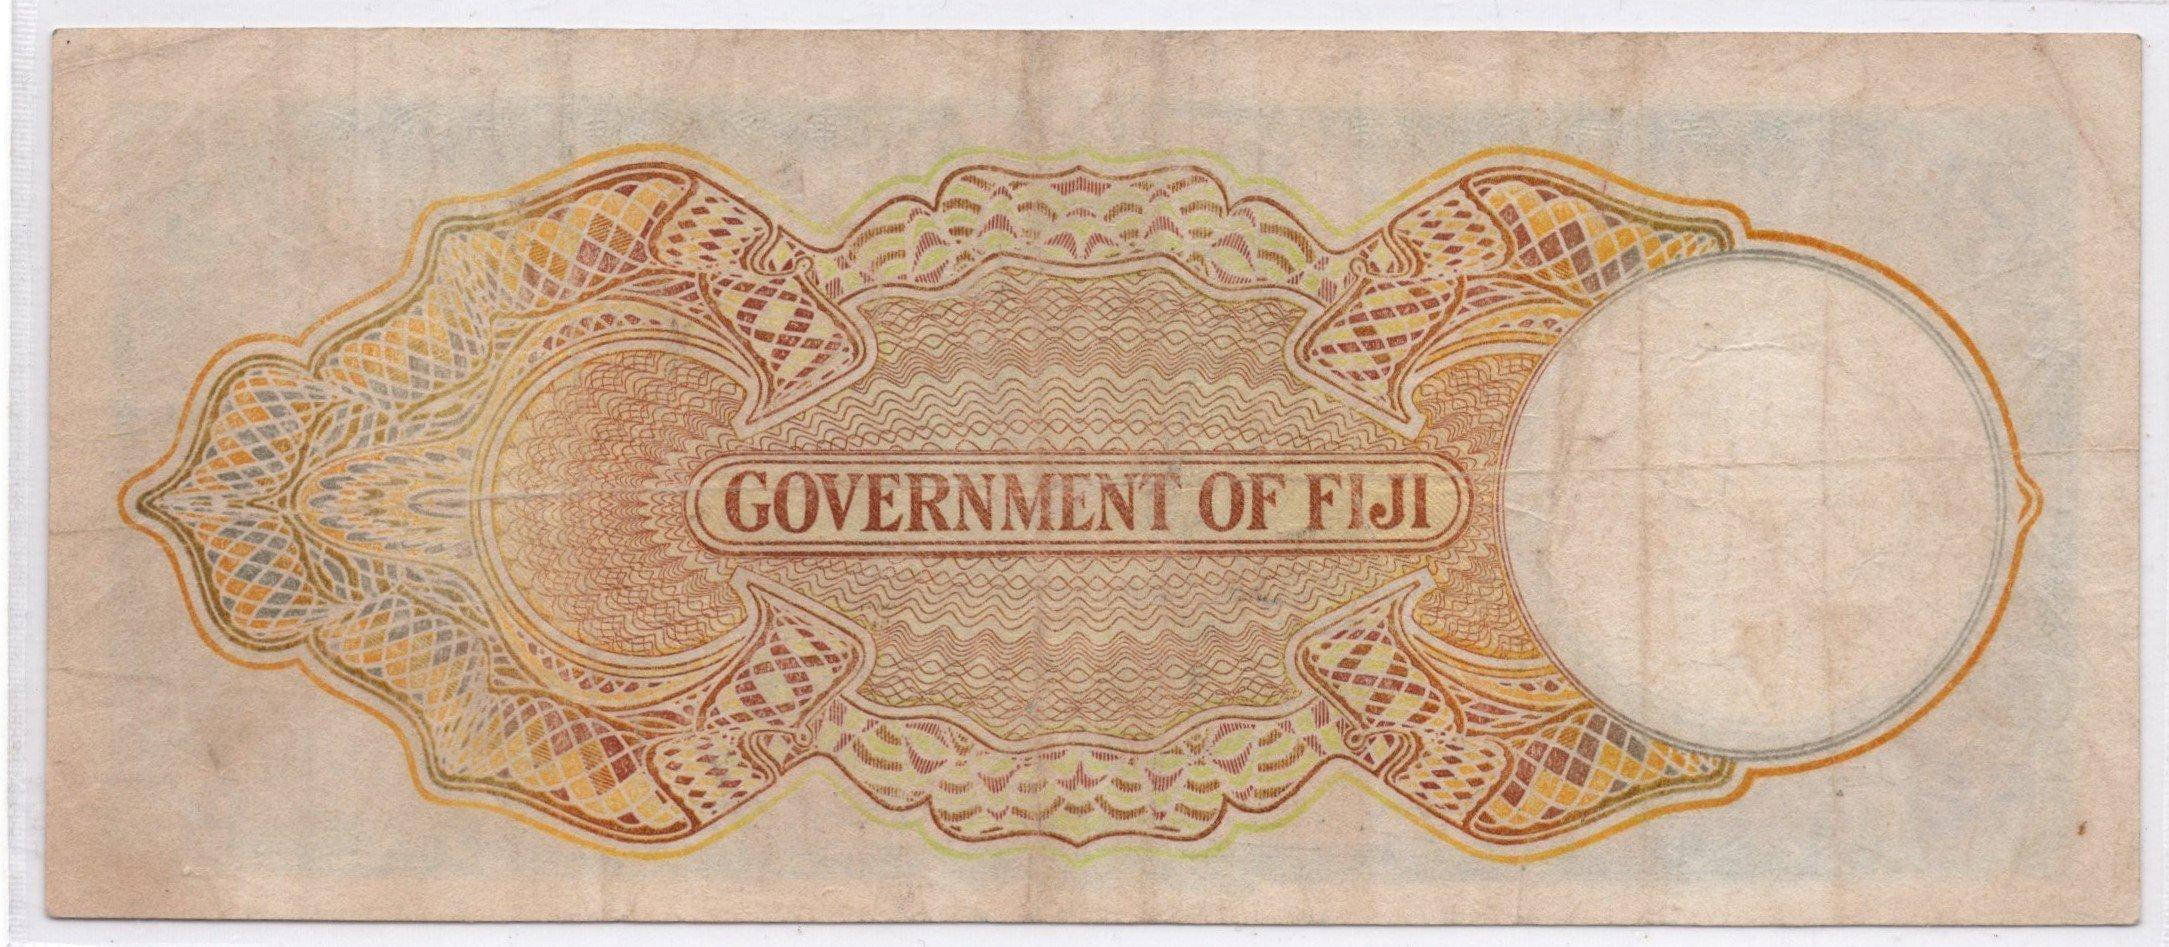 fiji 5 shillings